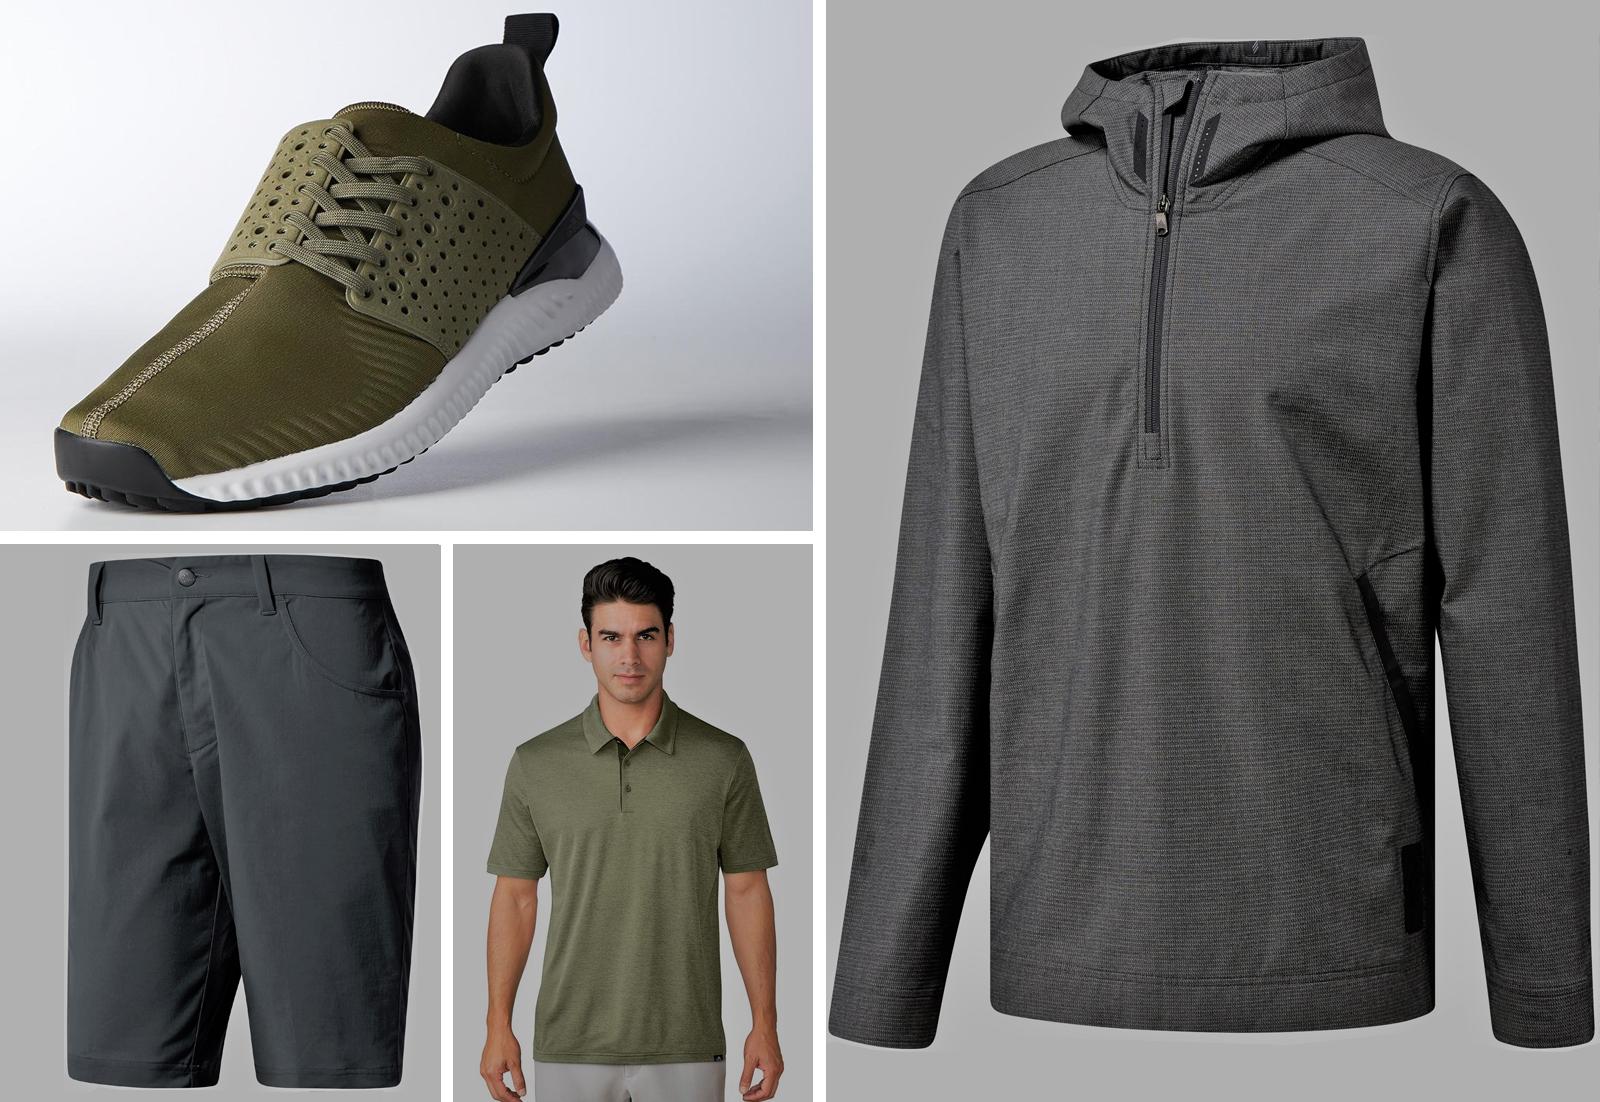 Dustin Johnson, sports adicross urban-golf collection